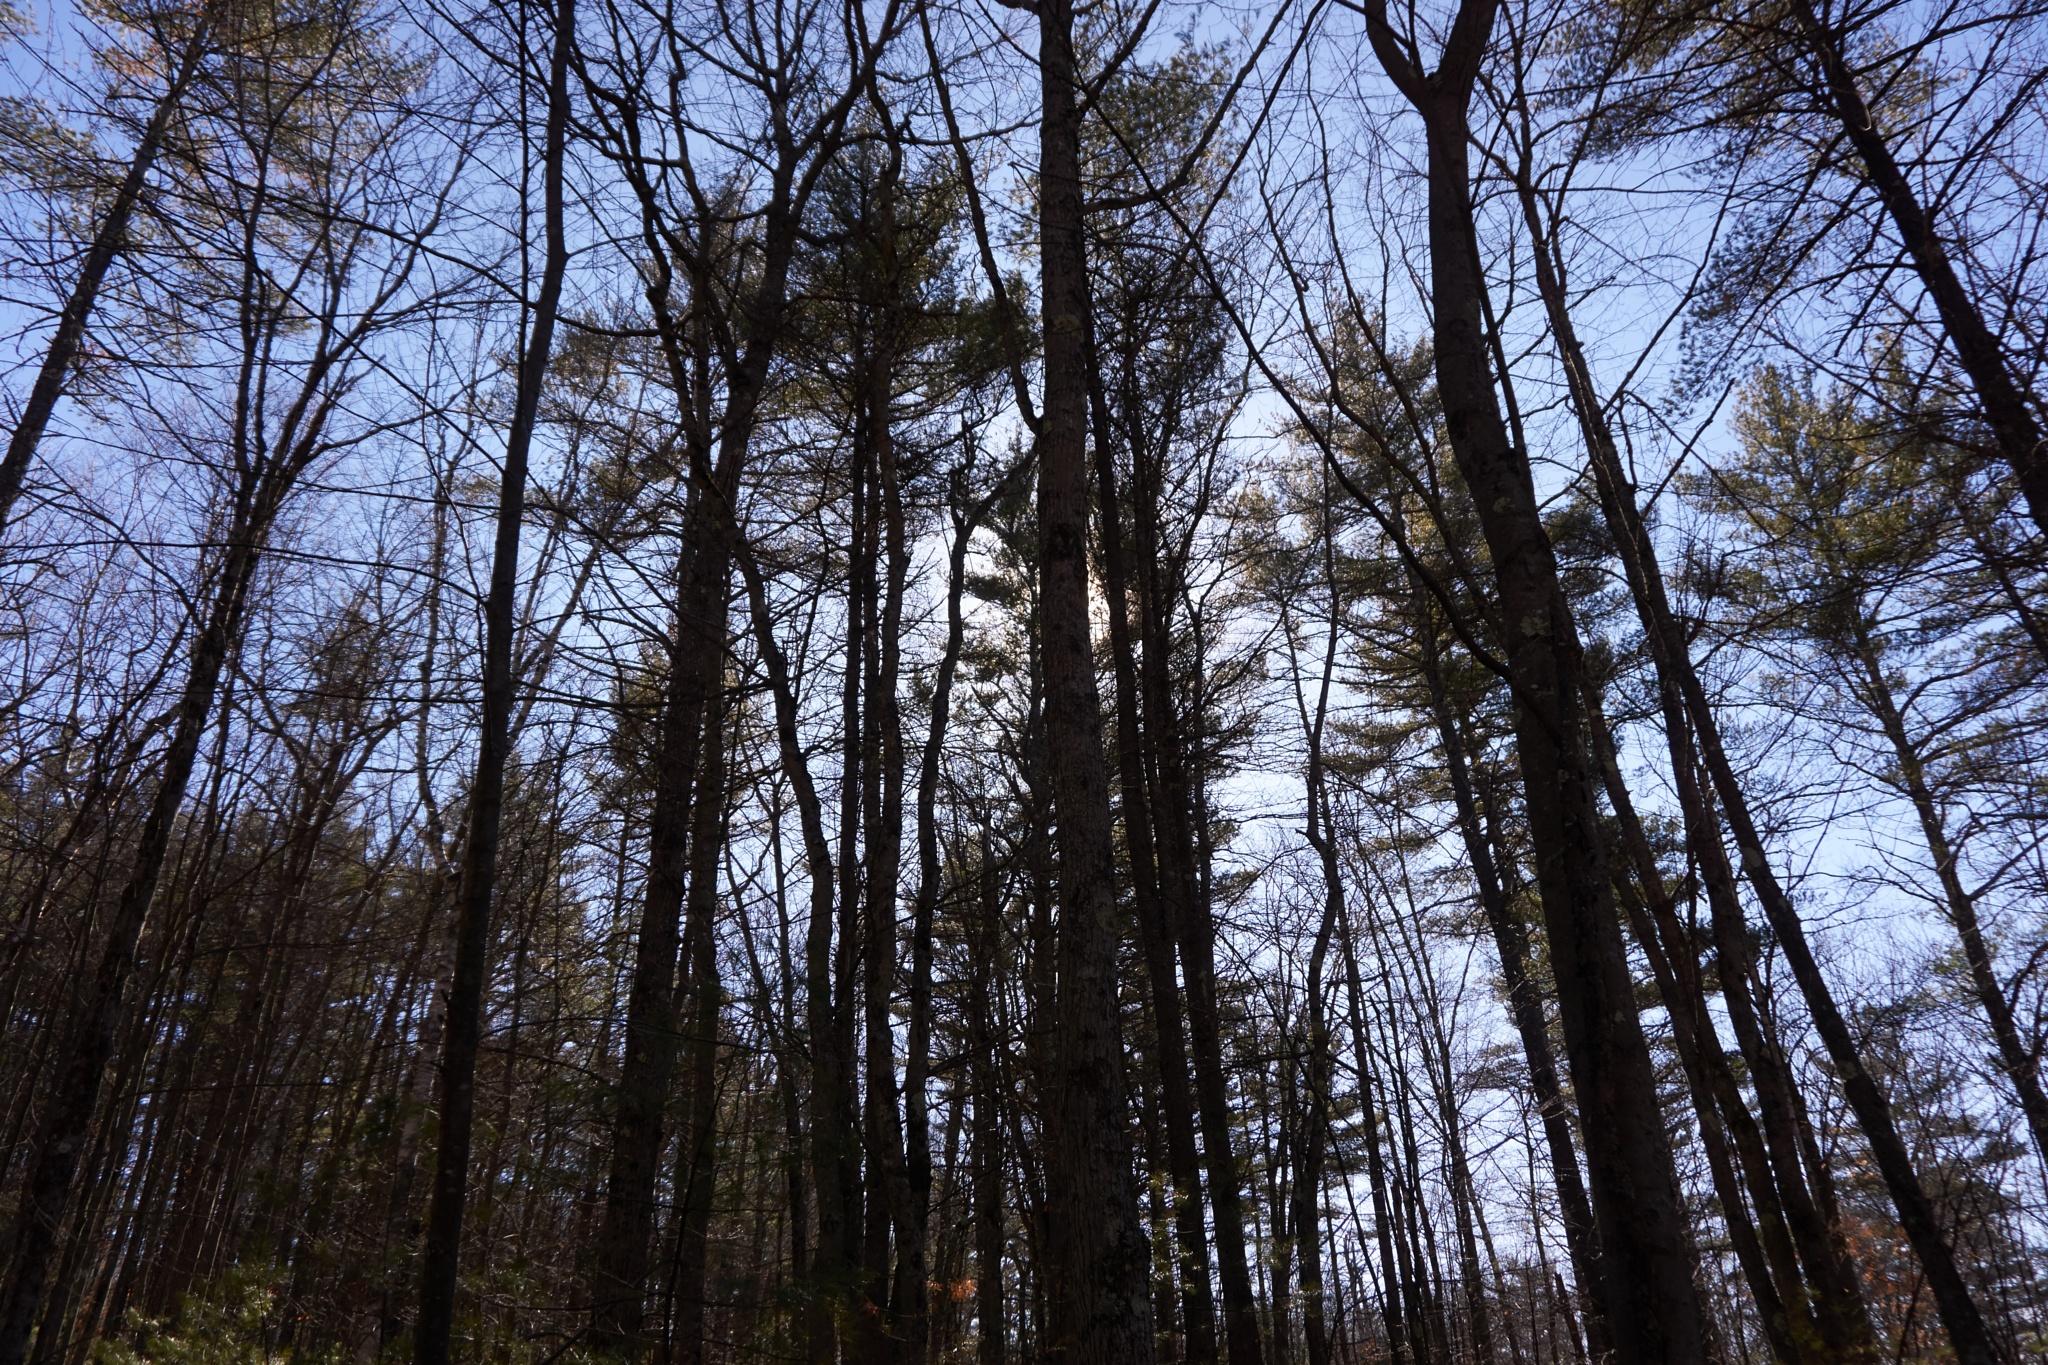 woods by Jerry Pandolfi